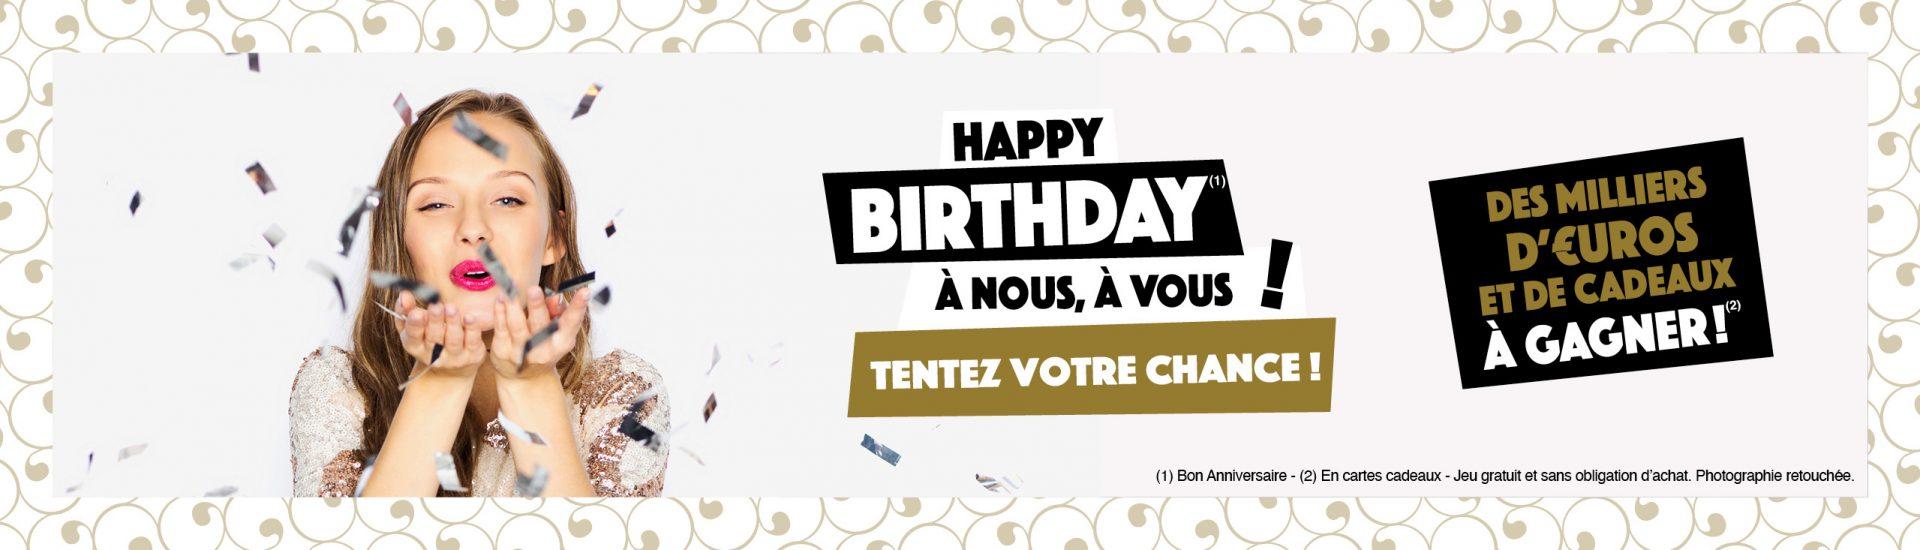 slide-home-evenement-happy-birthday-saint-sebastien-nancy